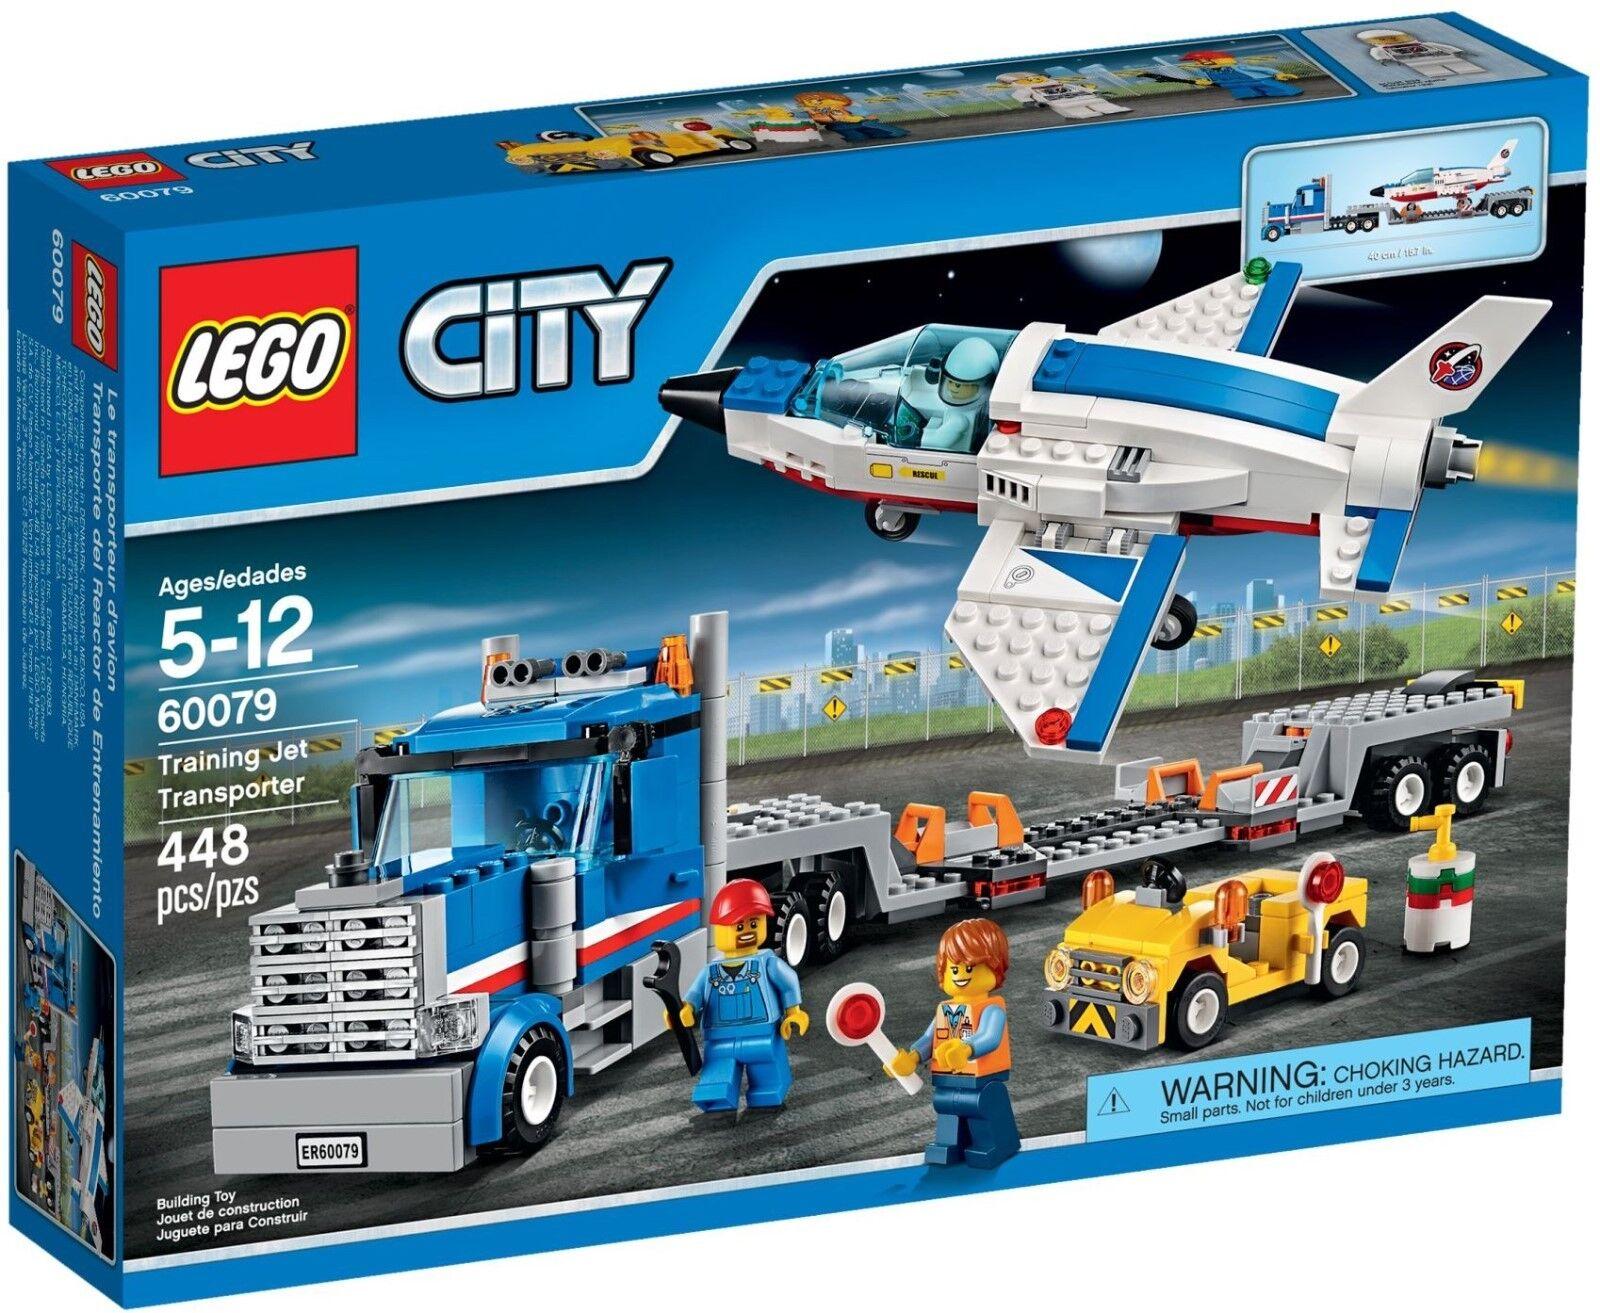 LEGO City Training Jet Transporter 60079 - Brand New